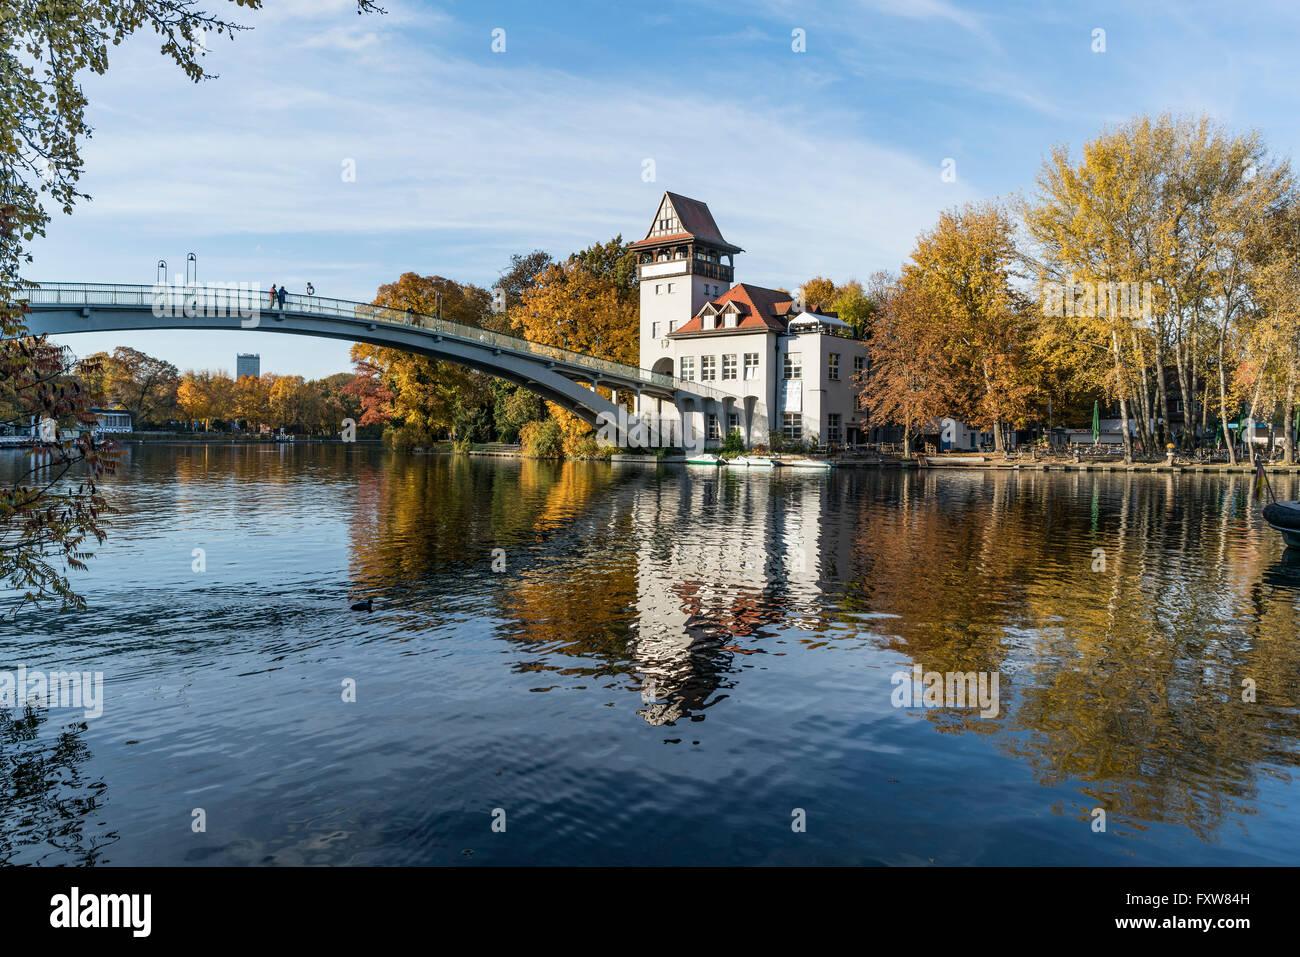 Insel der Jugend, Herbst, Insel der Jugend, Treptow, Spree, Berlin Stockbild